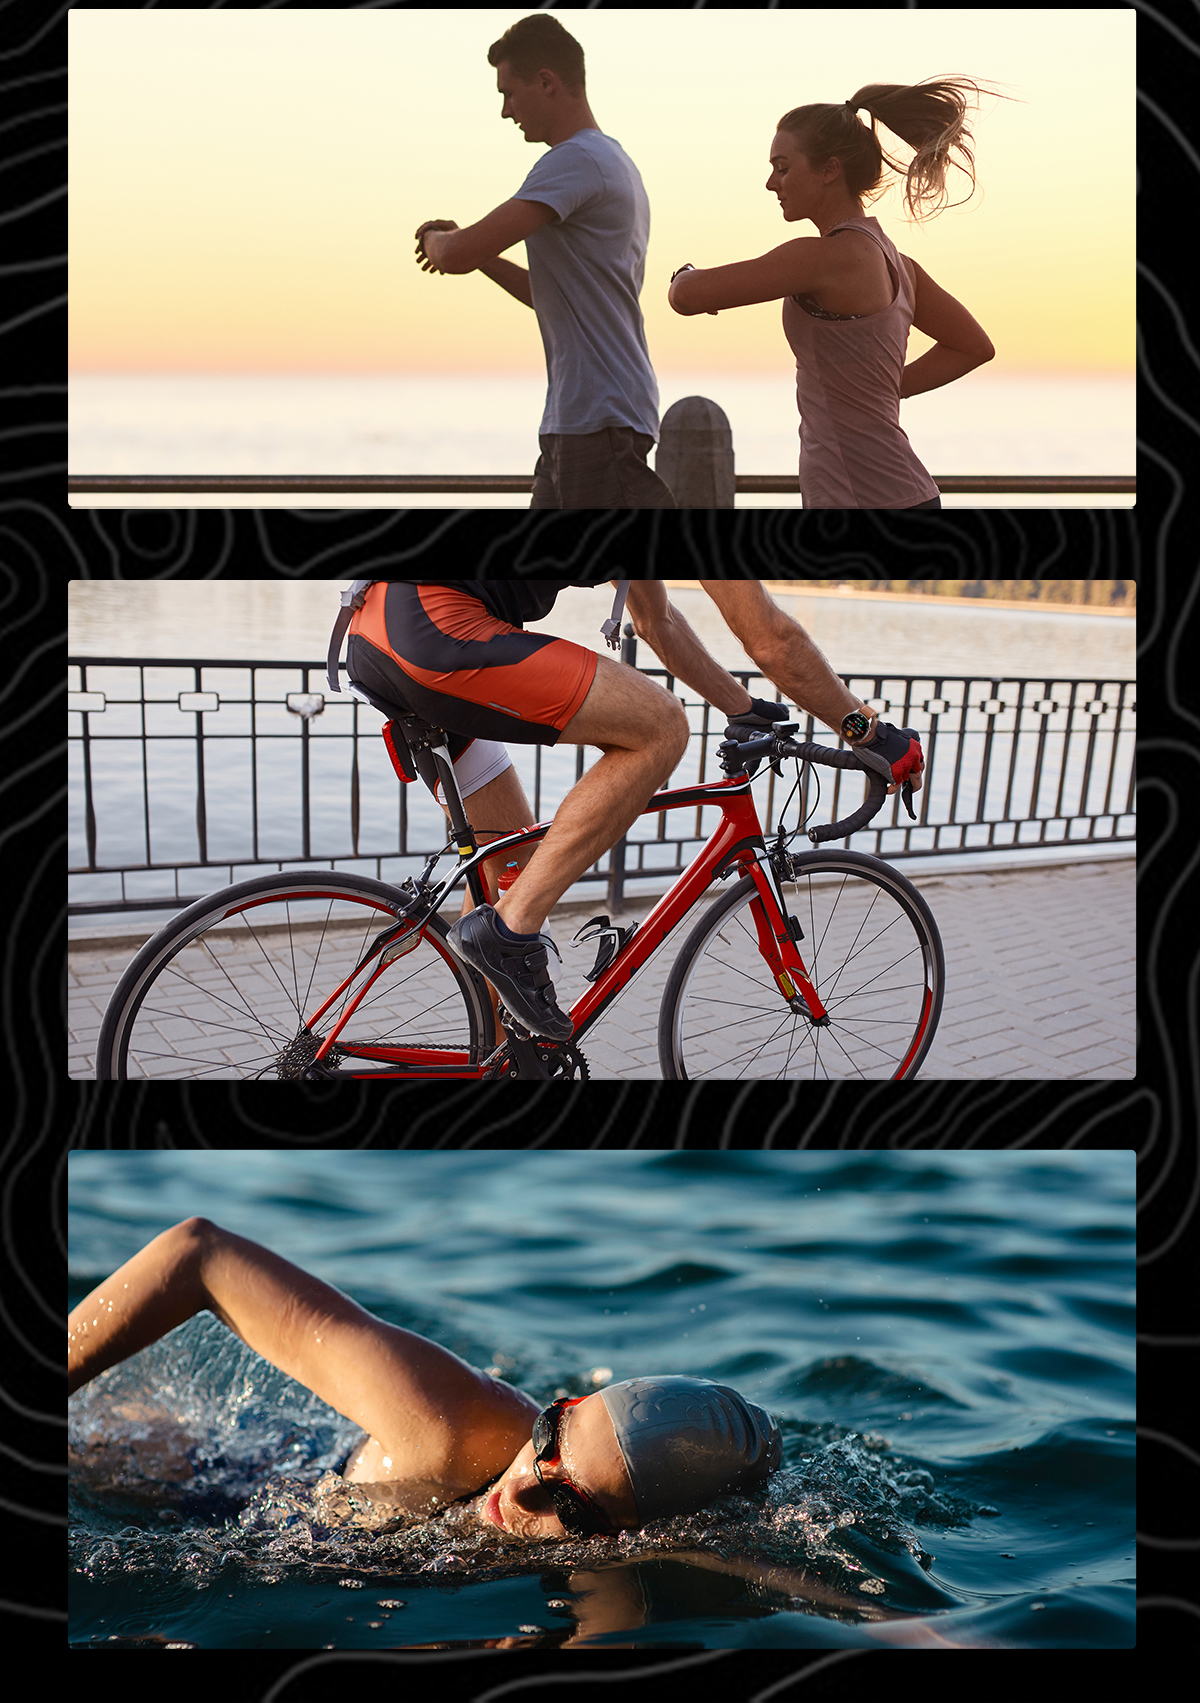 H5627710ff44e44b896ba213c552768208 2021 NEW Smart Watch Women Men Full Touch Fitness Tracker IP67 Waterproof Smartwatch For Android Xiaomi Redmi